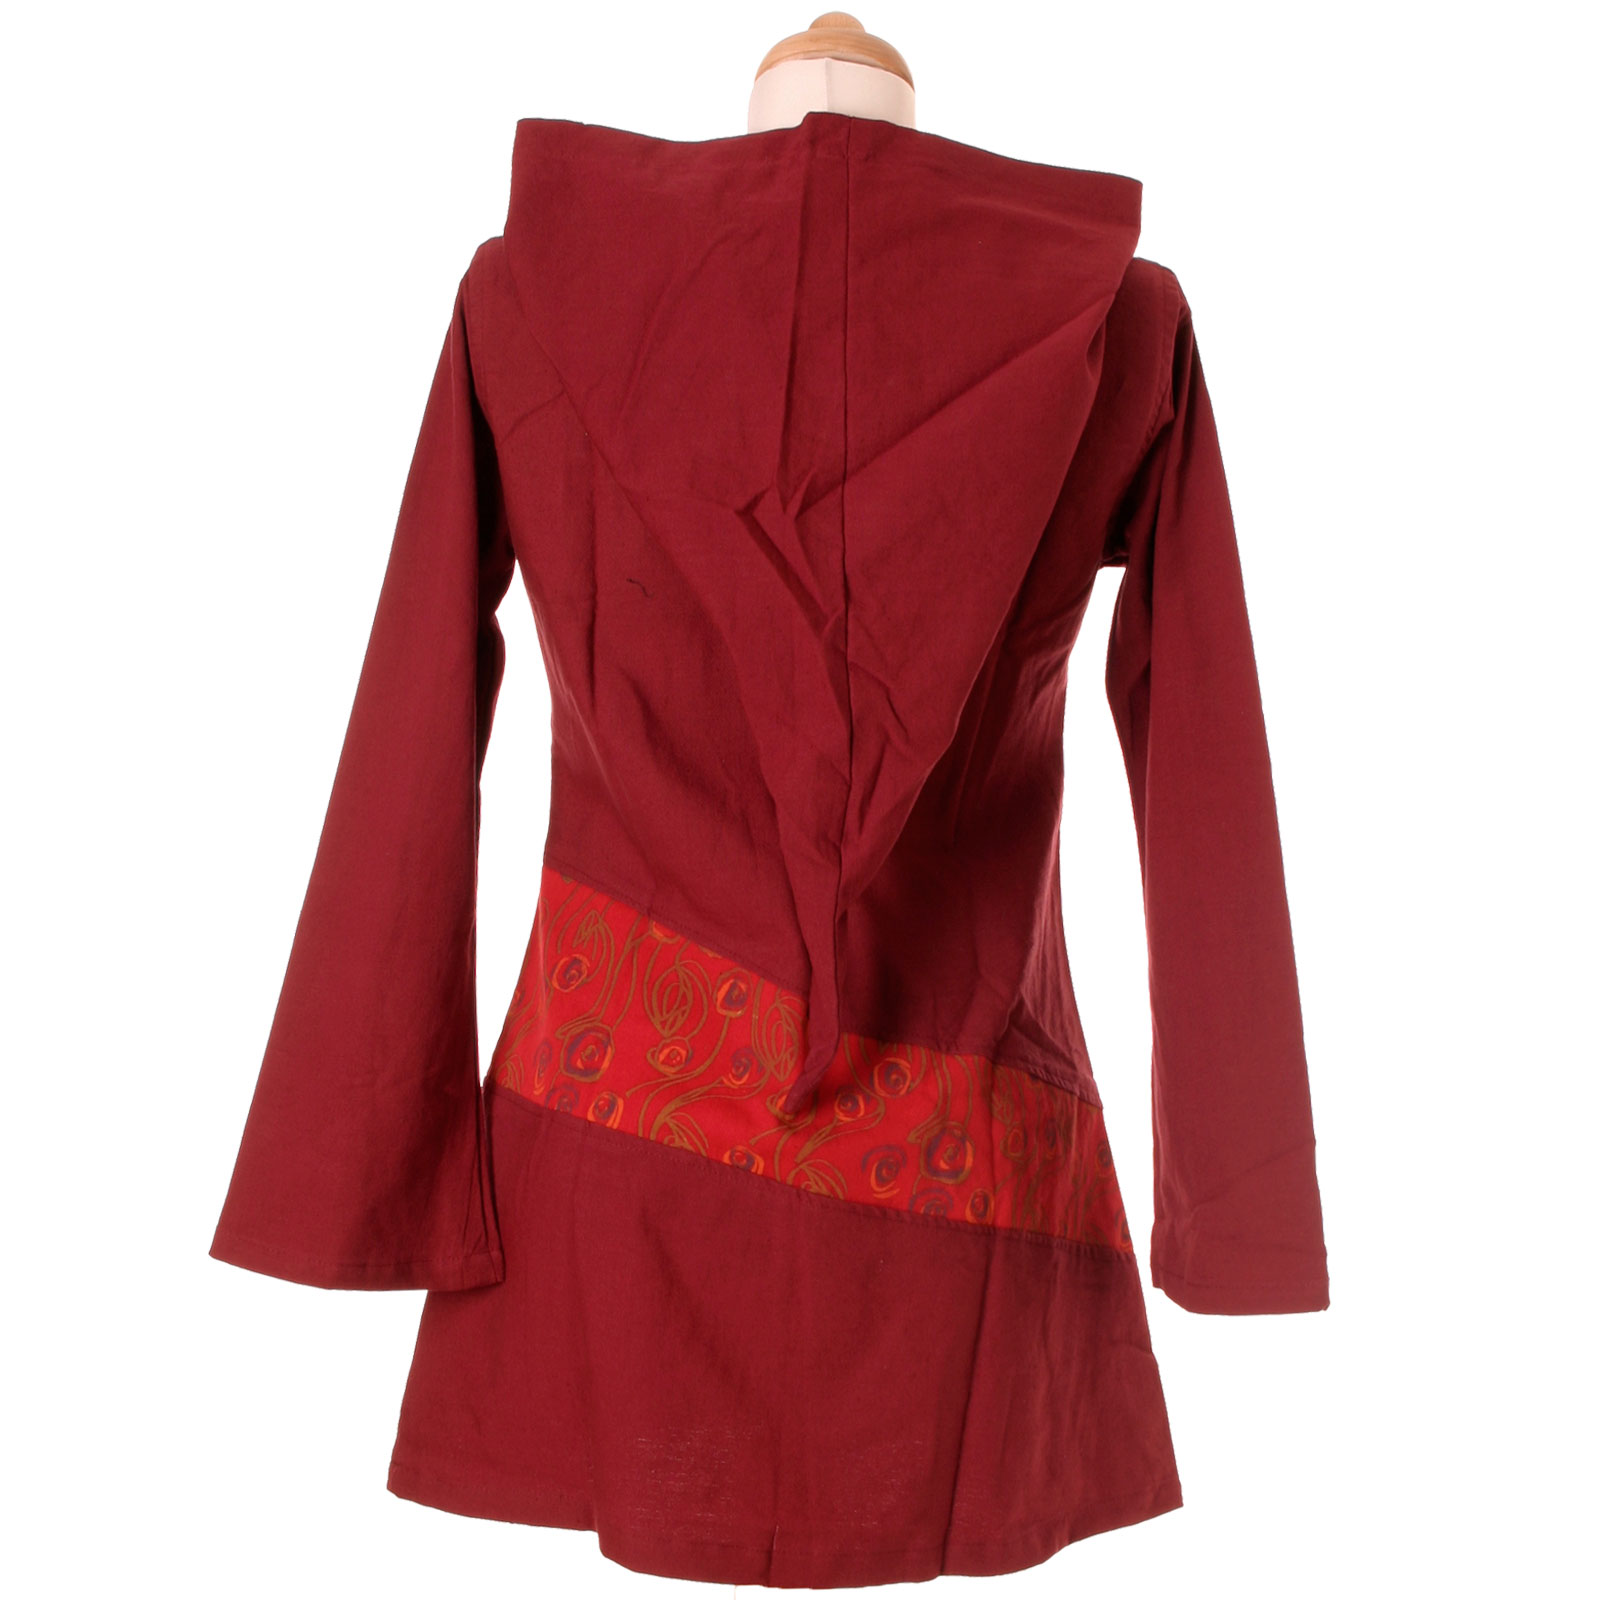 vishes goa hippie kleid zipfelkapuze tunika kapuze hoodie hoody ethno nepal xxl ebay. Black Bedroom Furniture Sets. Home Design Ideas